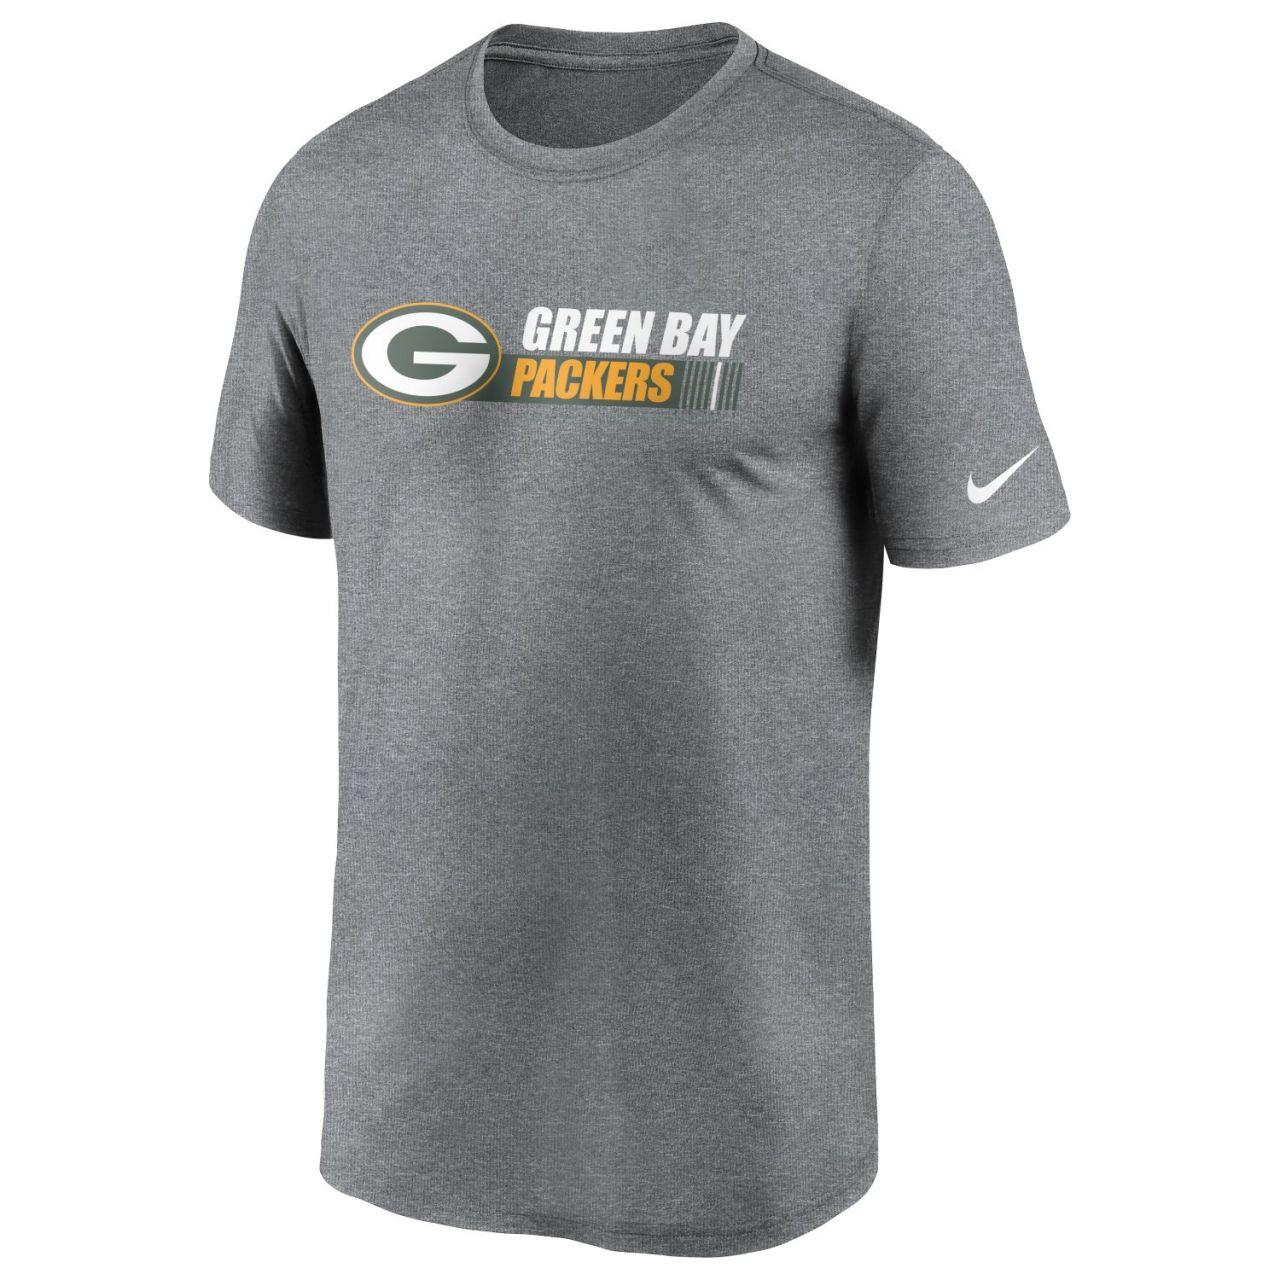 amfoo - Nike Dri-FIT Legend Shirt - PRIMETIME Green Bay Packers